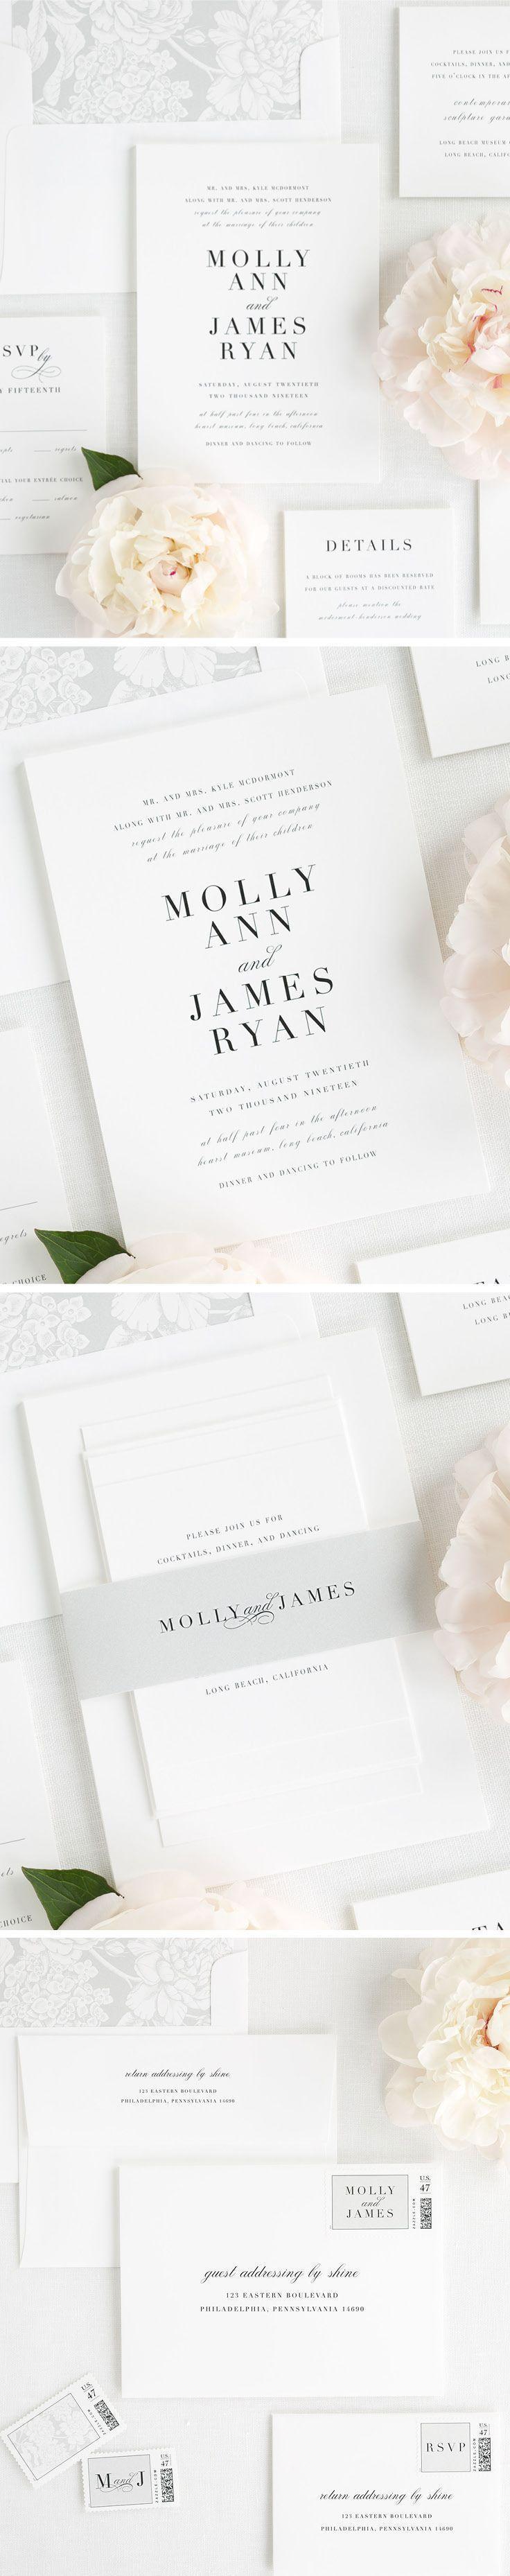 Serif Romance Wedding Invitations | Classic weddings, Invitation ...